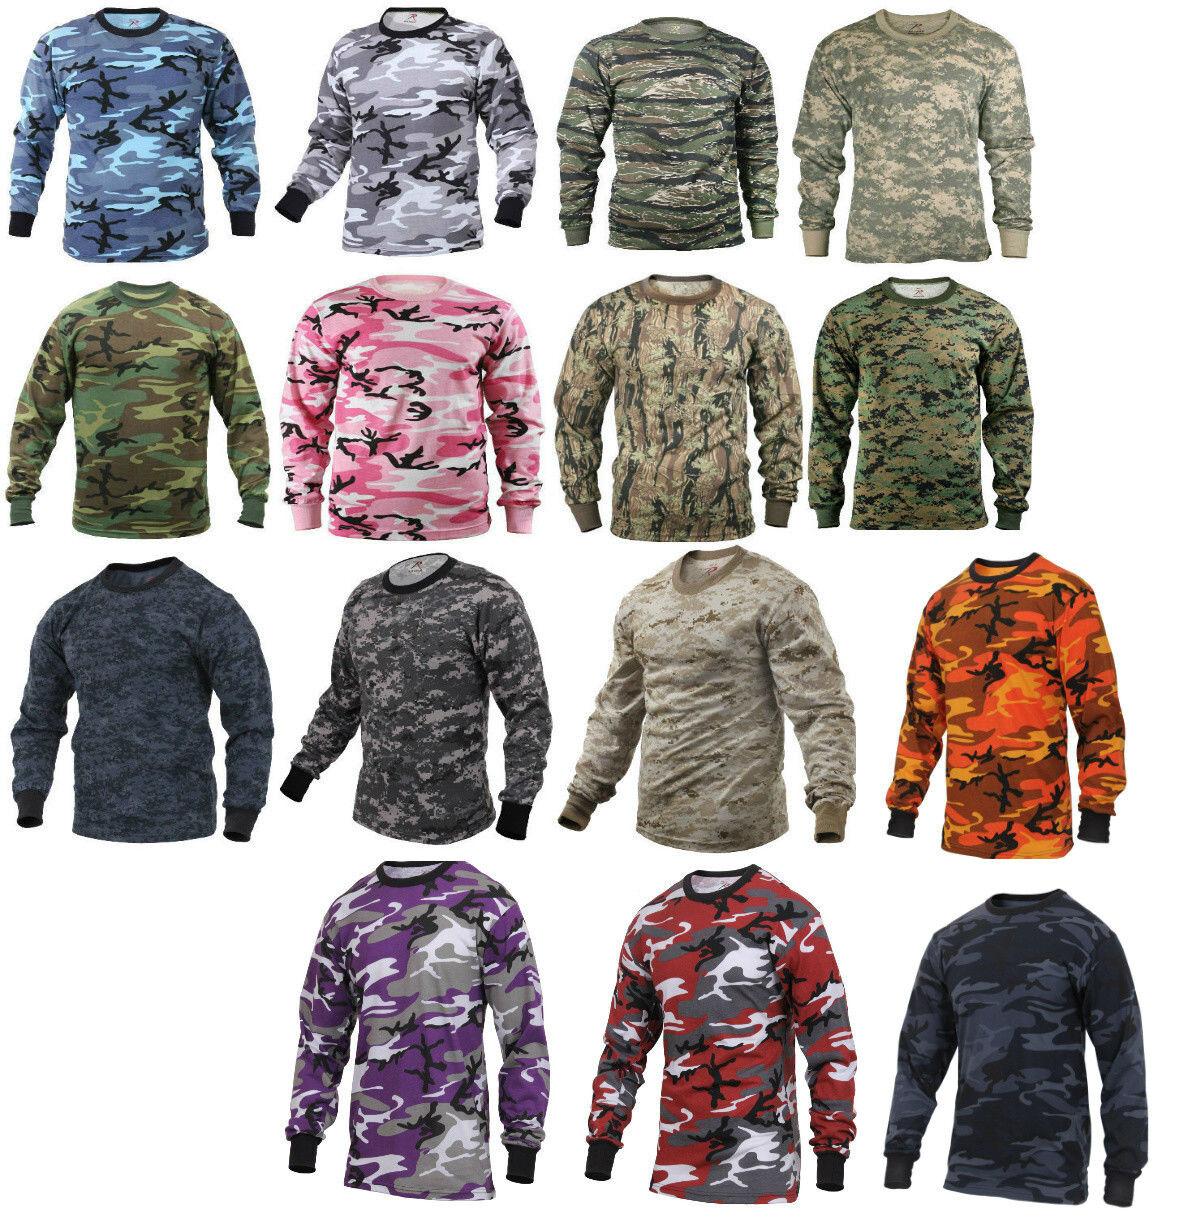 Long Sleeve T-Shirt Camo Tactical Military Crew Tee Undershi